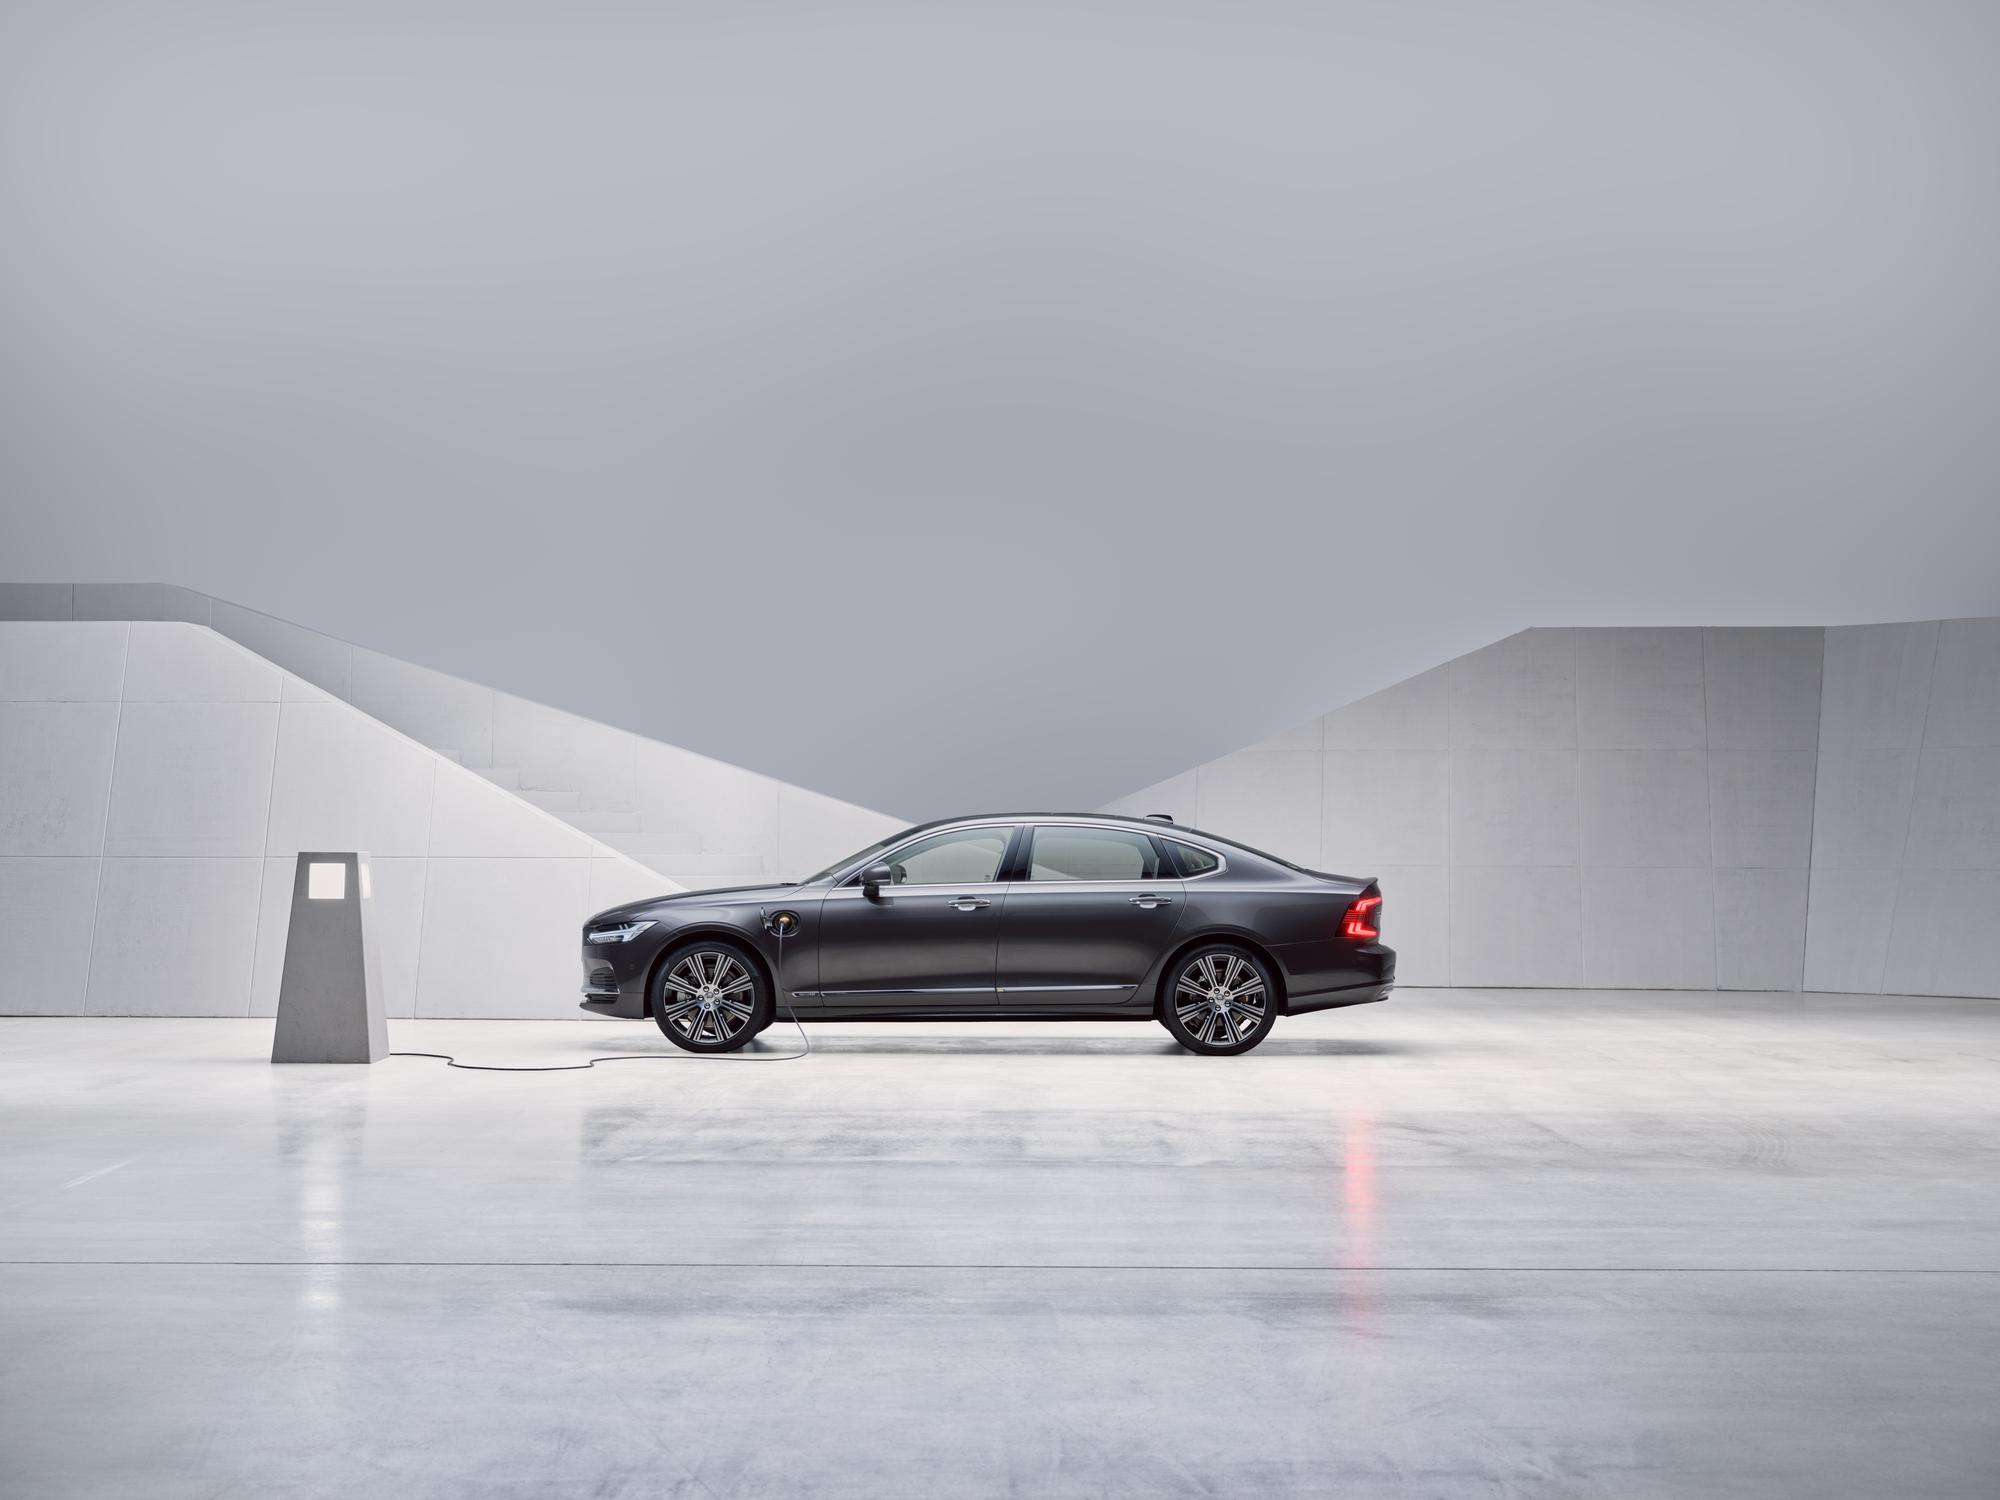 Volvo S90 T8 Recharge